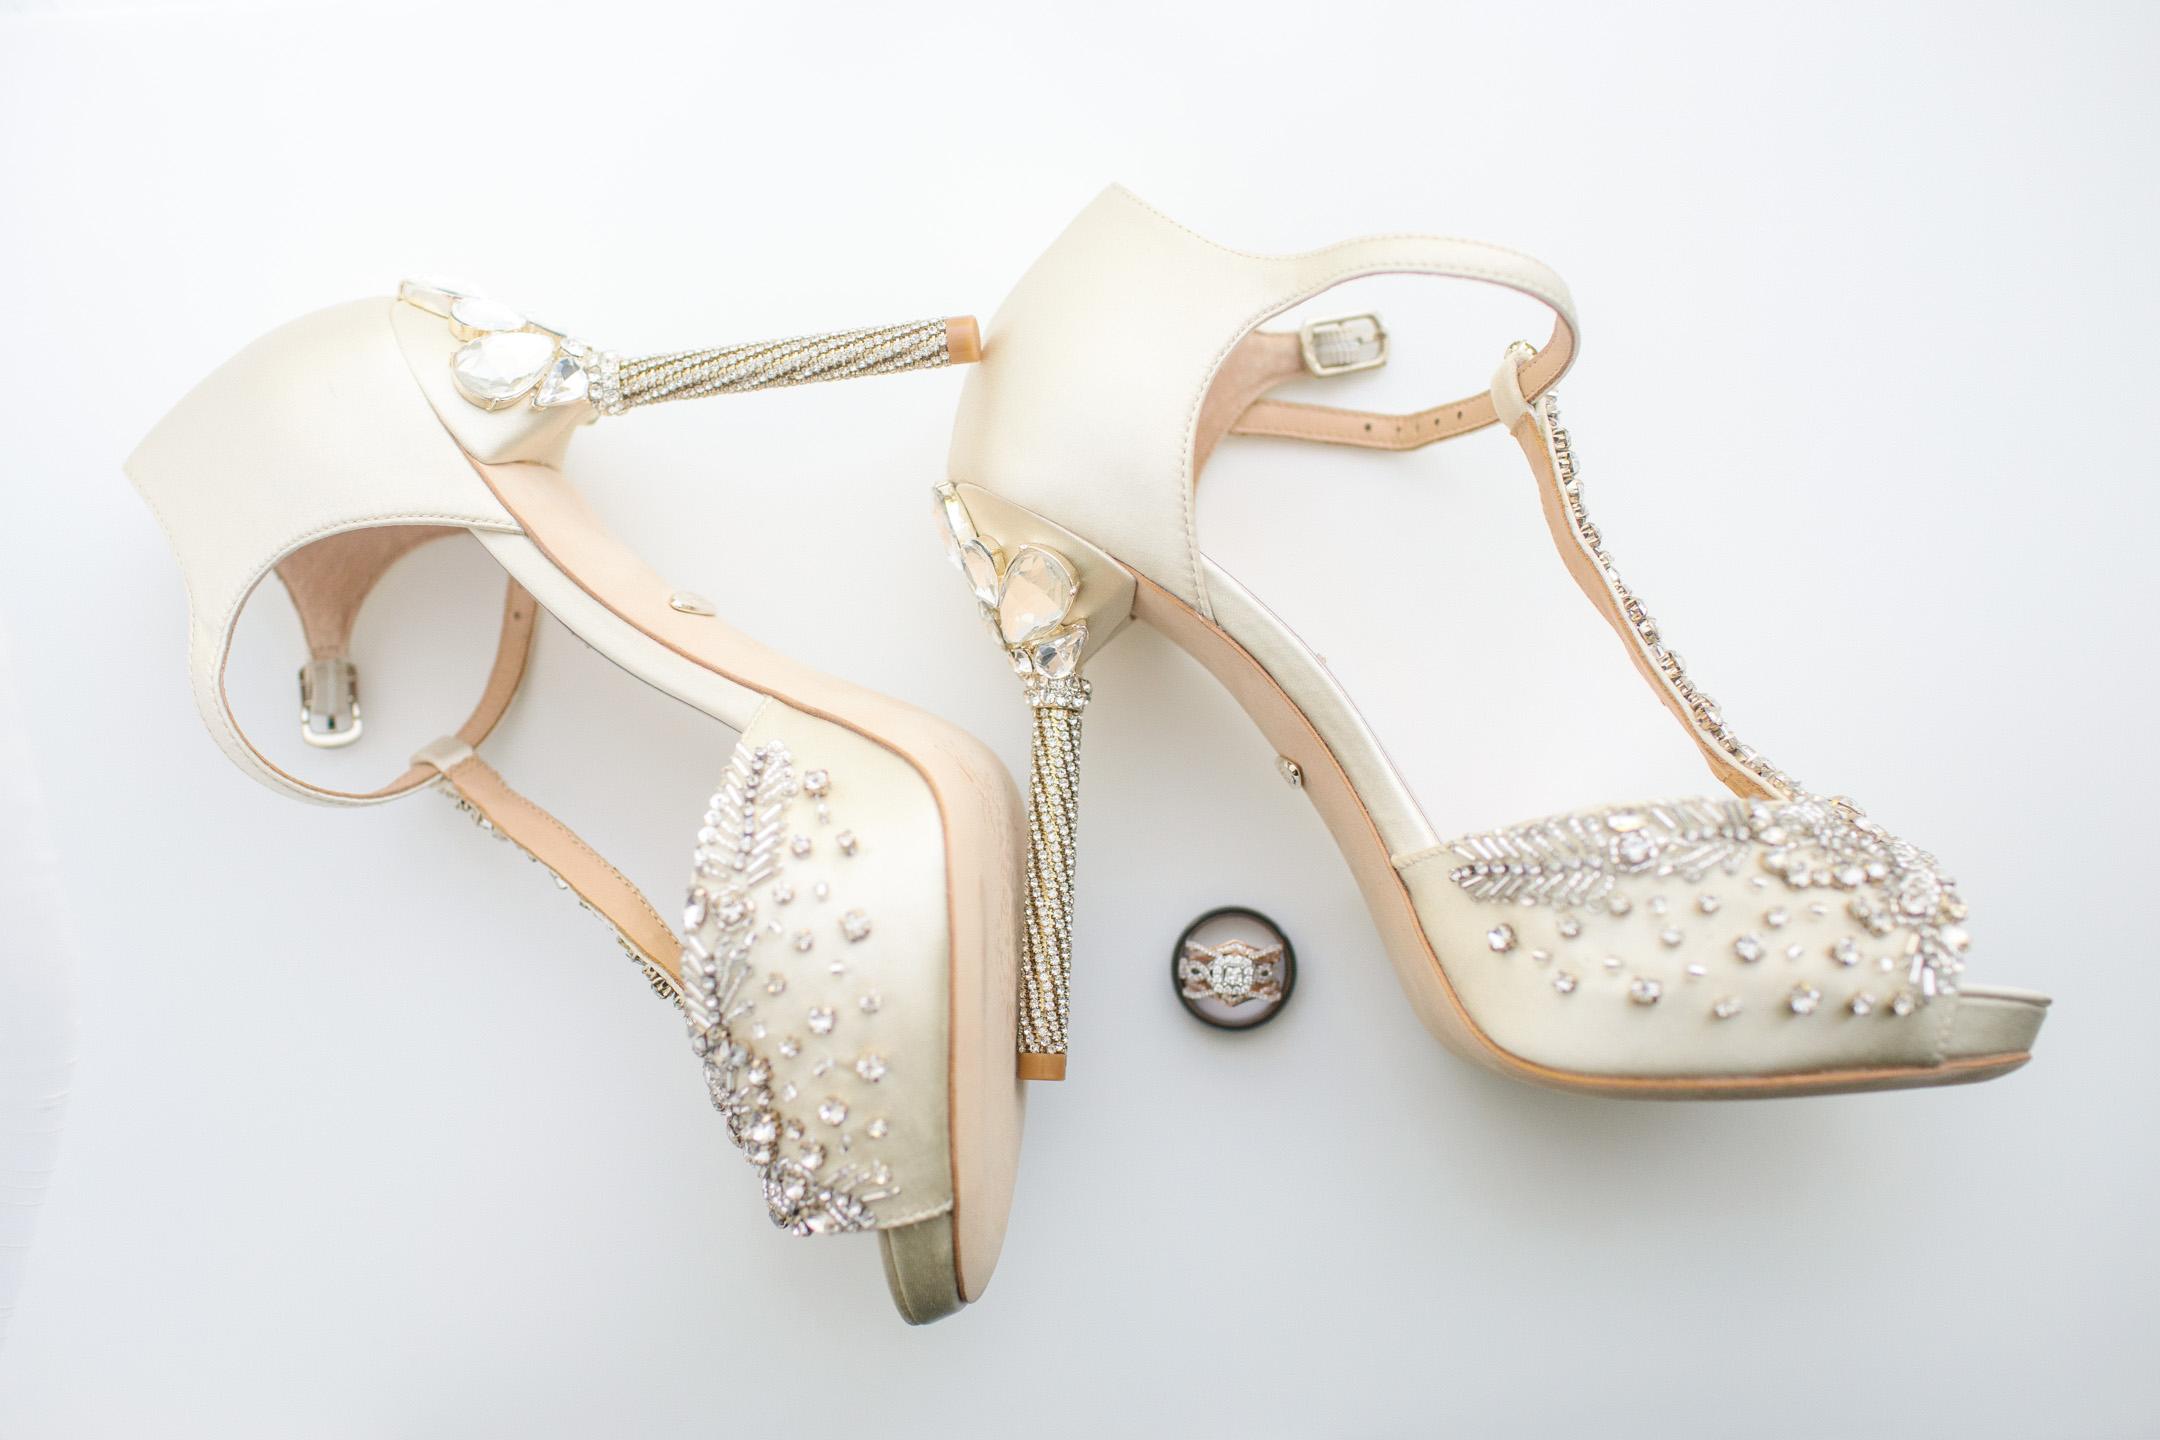 wedding shoes and wedding rings flatlay